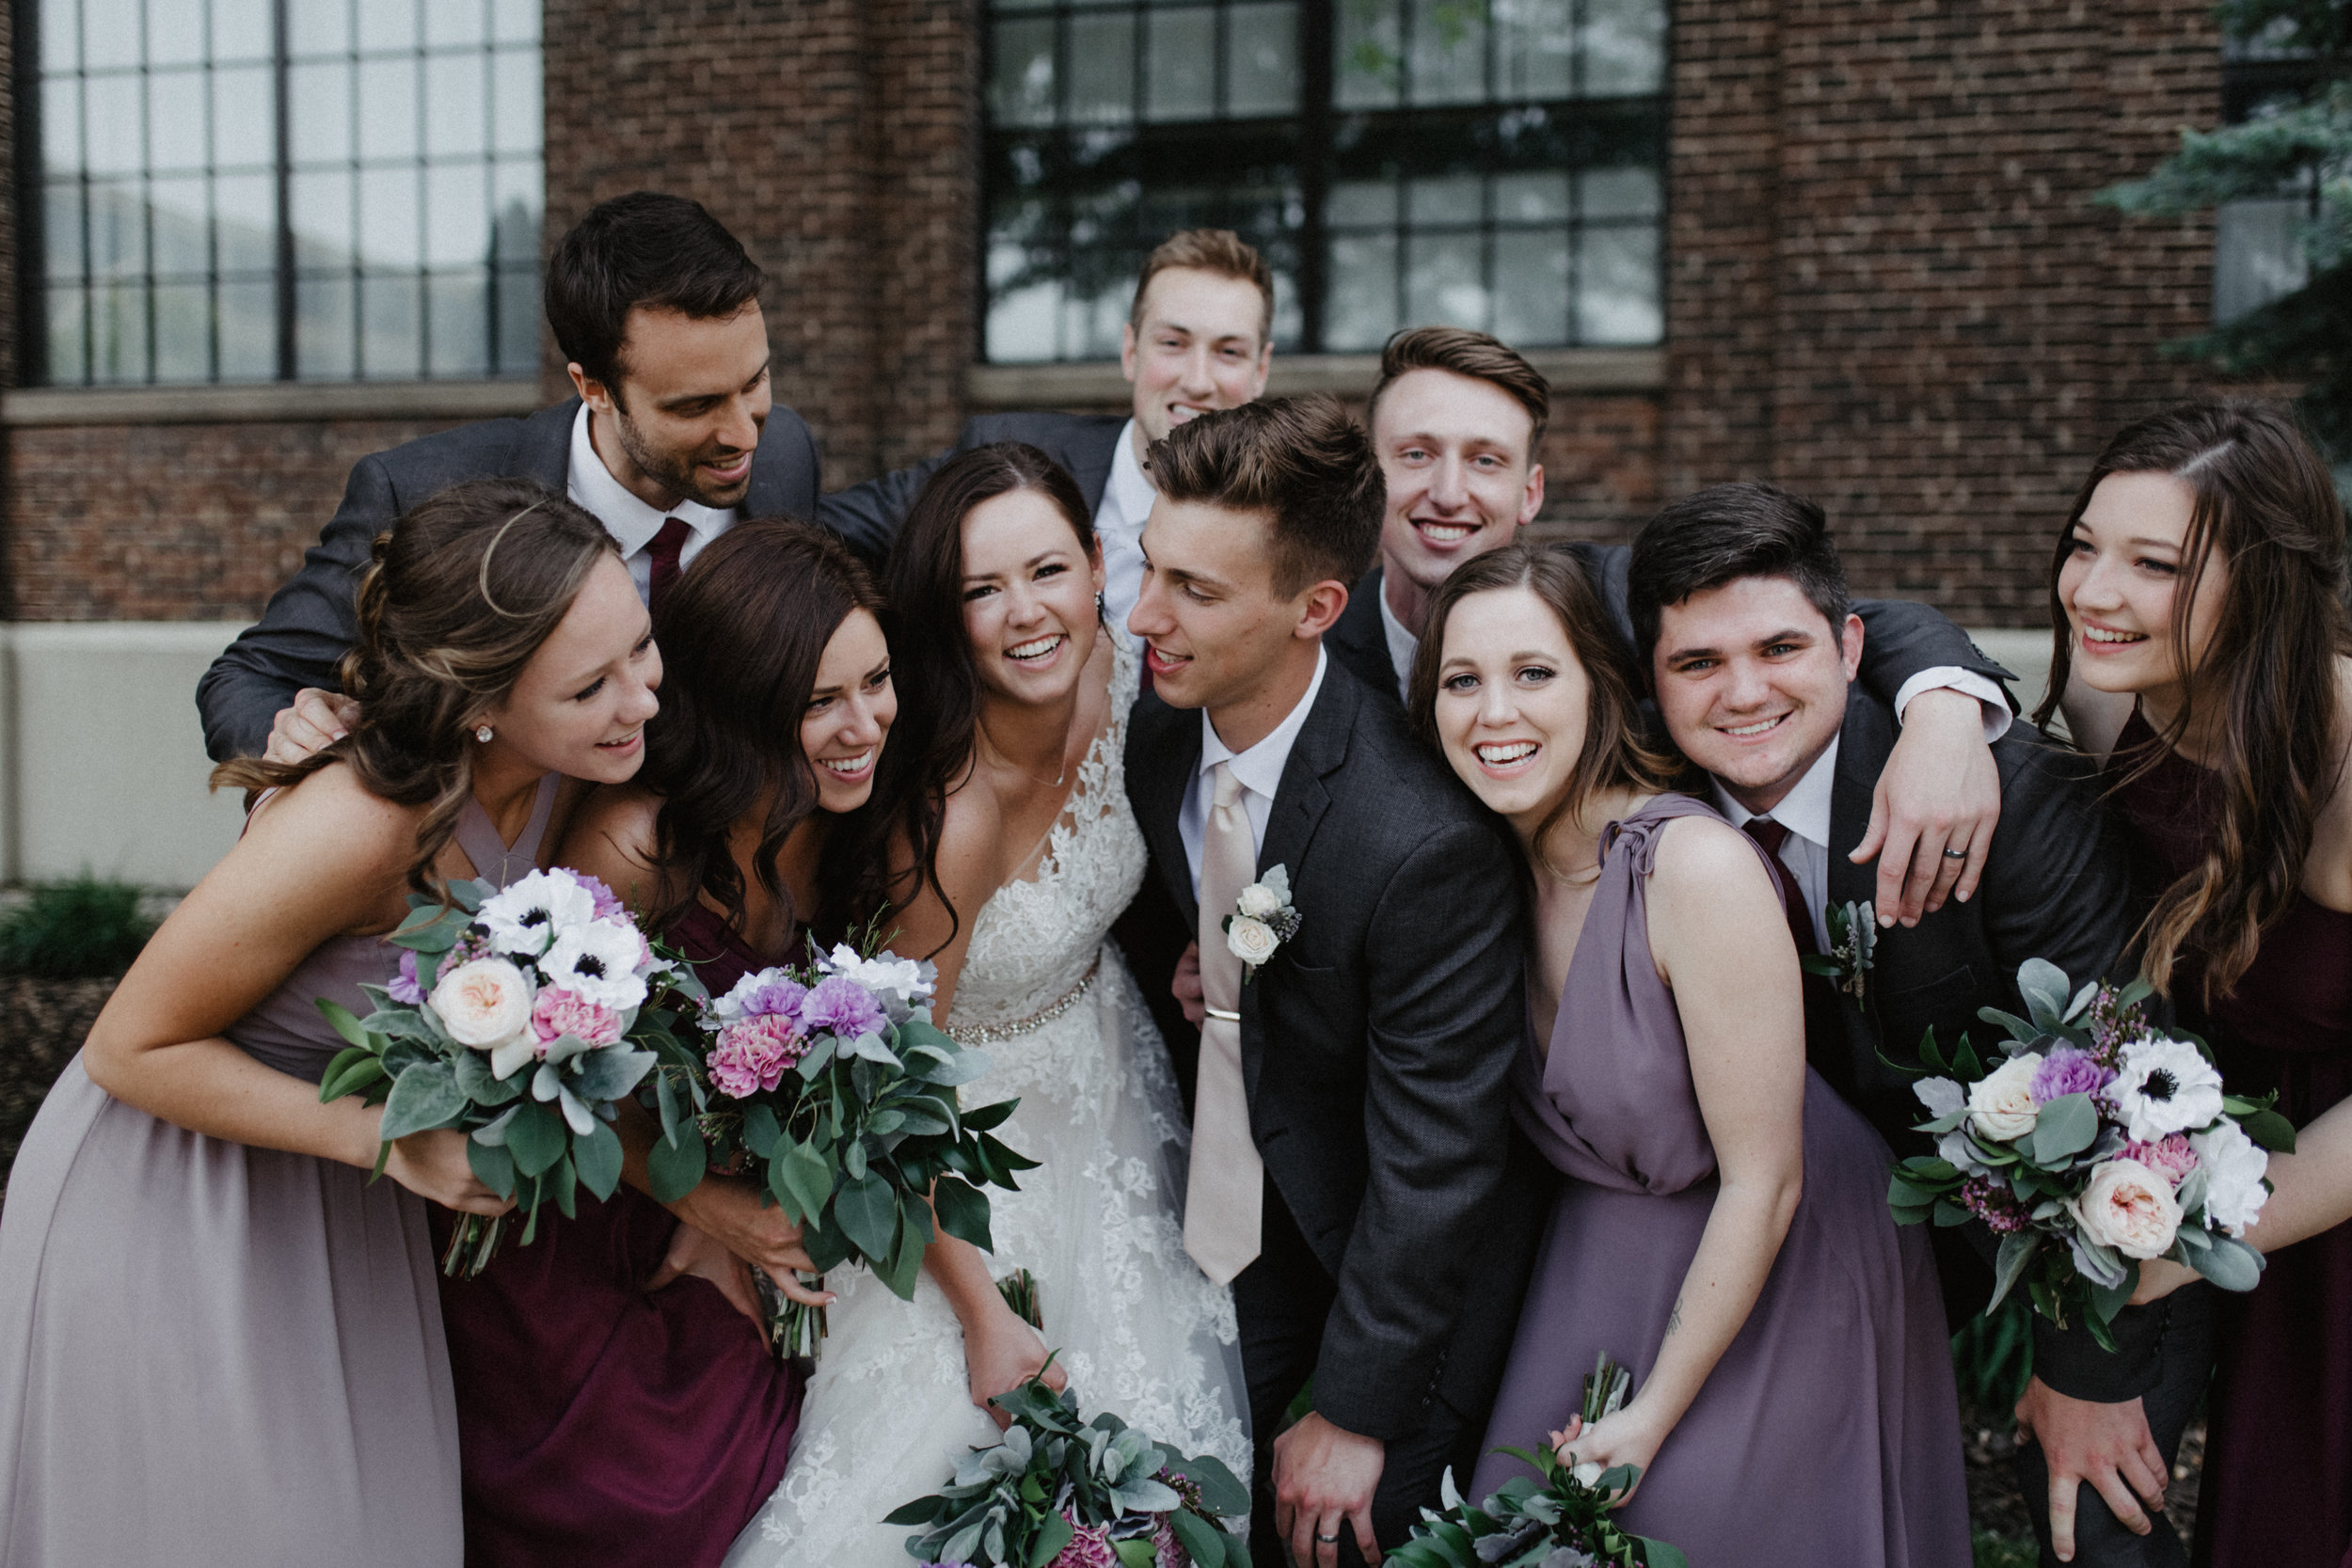 GRAYCENTOMHAMILTON-GRAND-RAPIDS-WEDDING-PHOTOGRAPHY-40.jpg